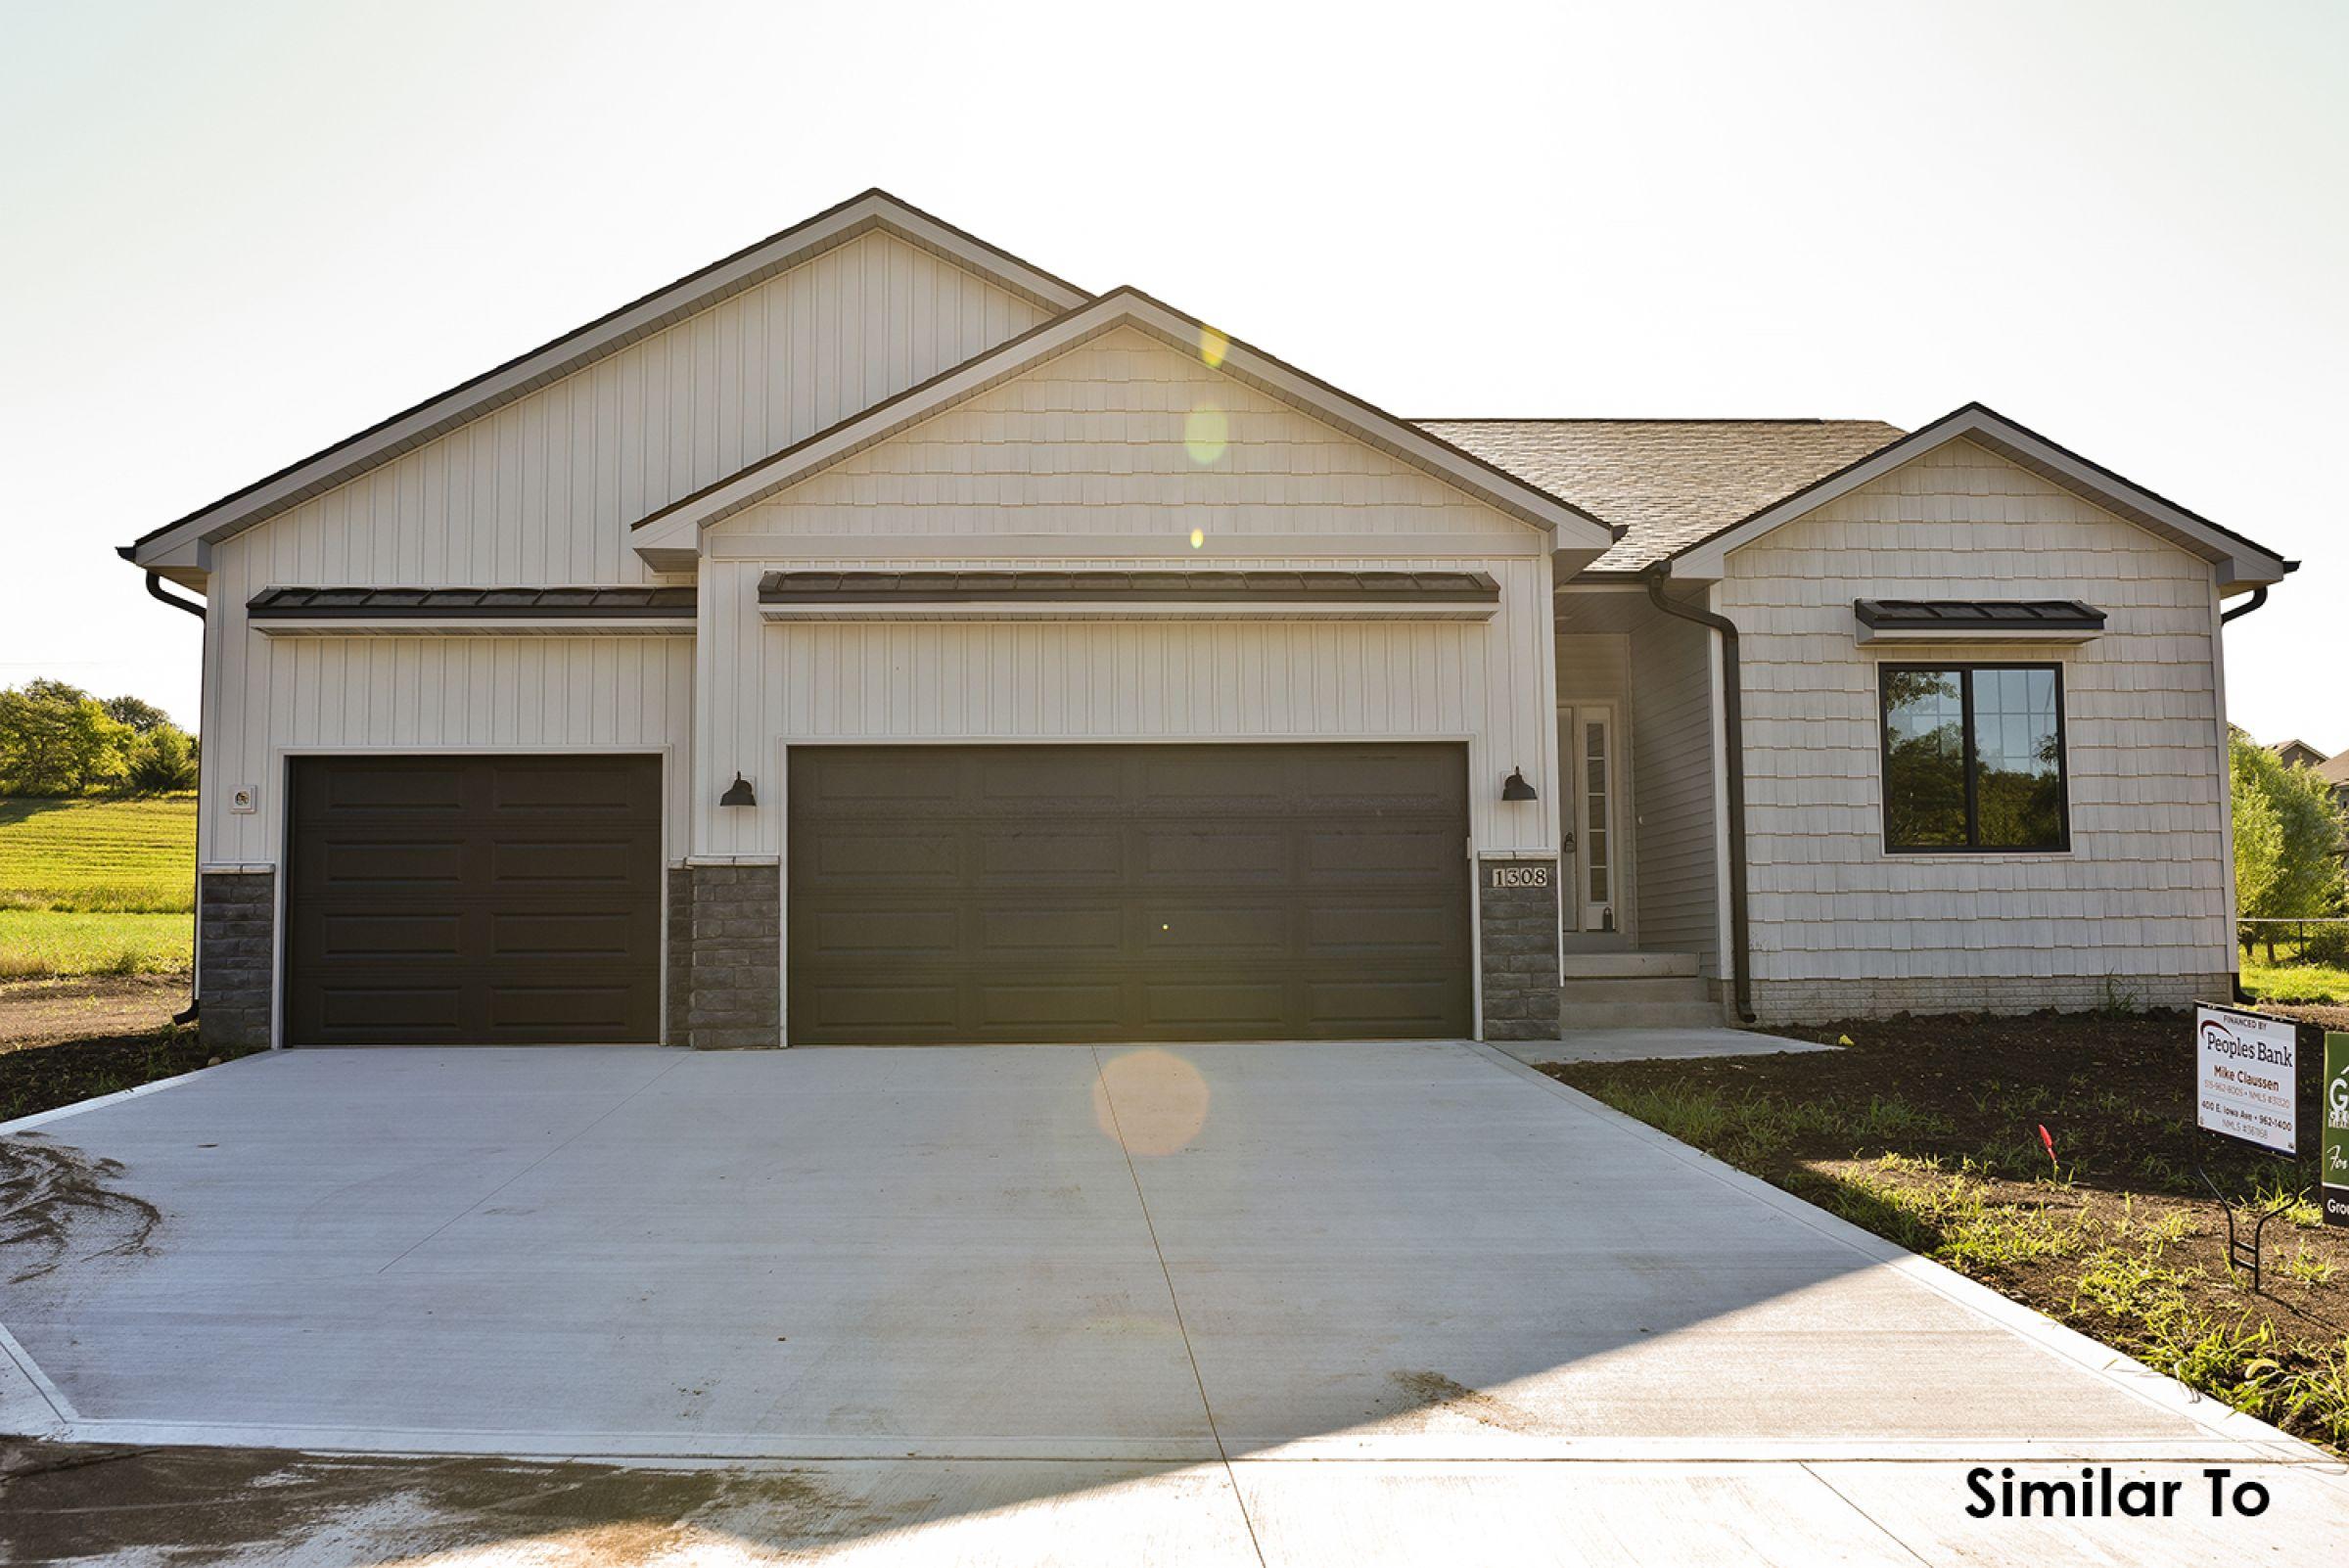 residential-warren-county-iowa-1-acres-listing-number-14995-0-2020-08-03-165345.jpg